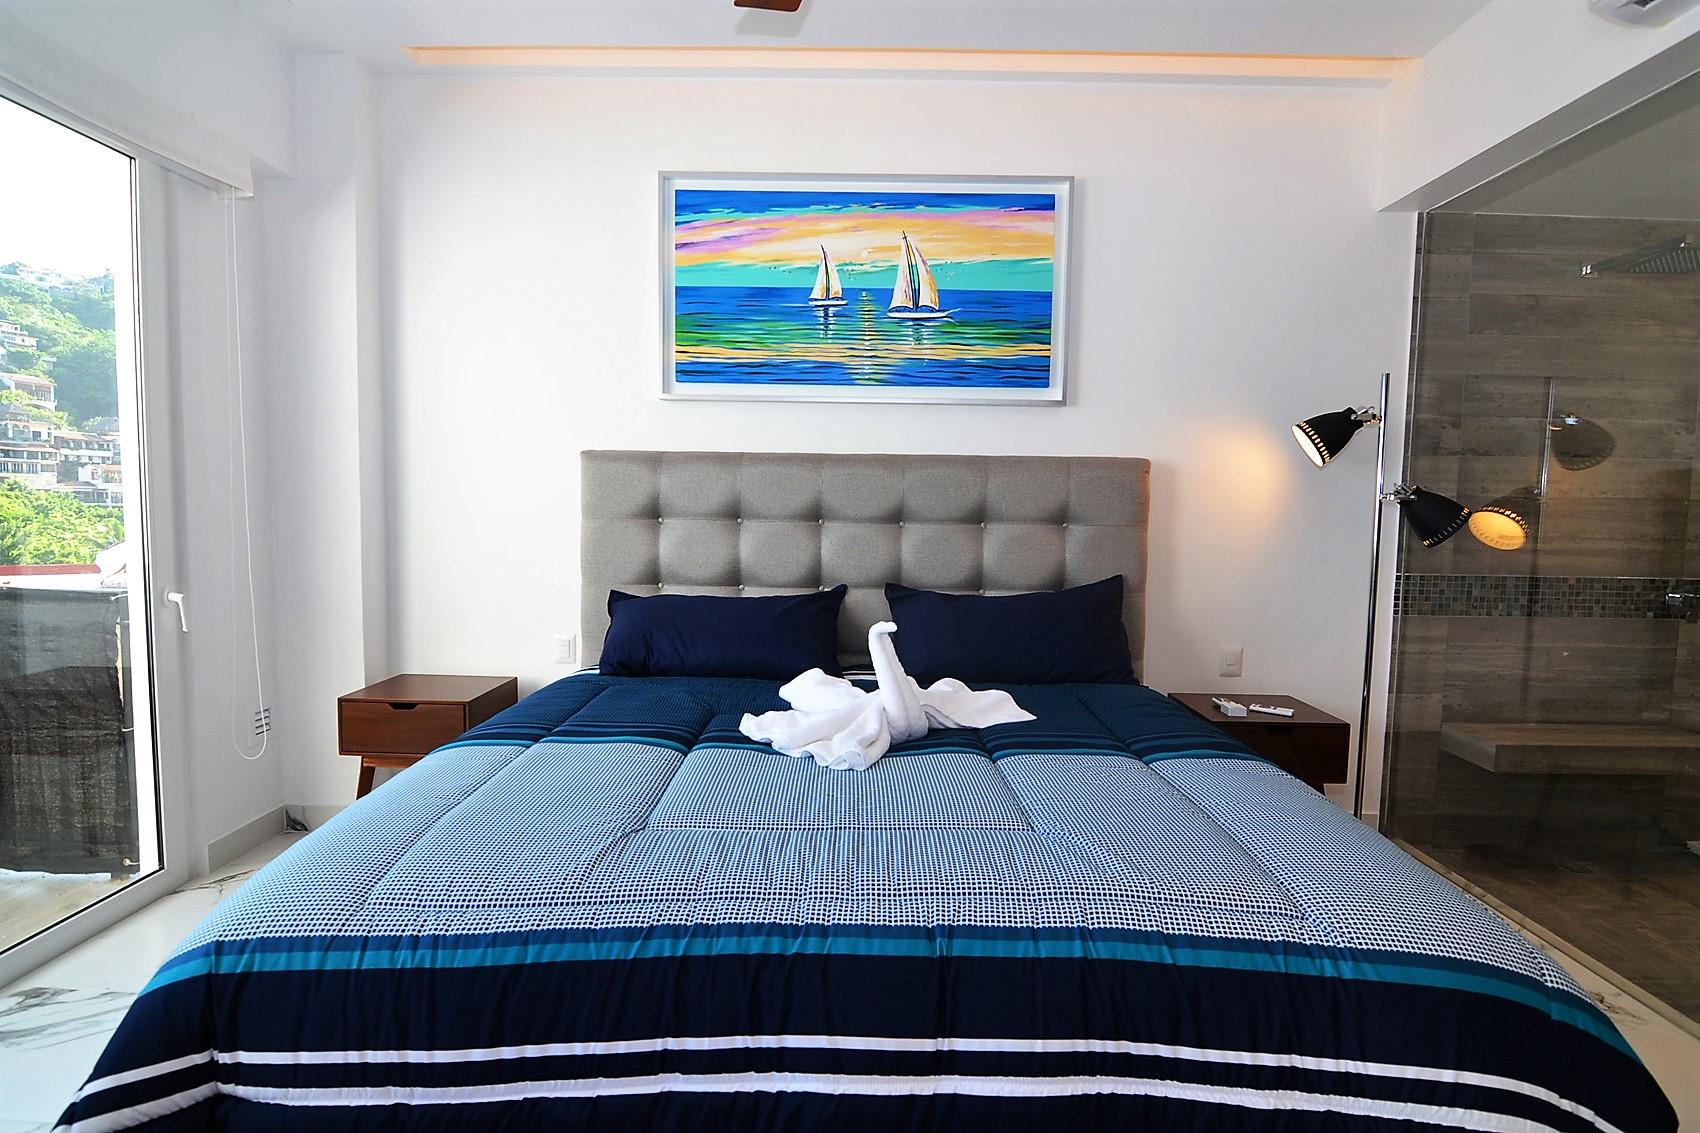 Condo Avida Super Studio 4 - Puerto Vallarta Furnished Condo Romantic Zone (19)